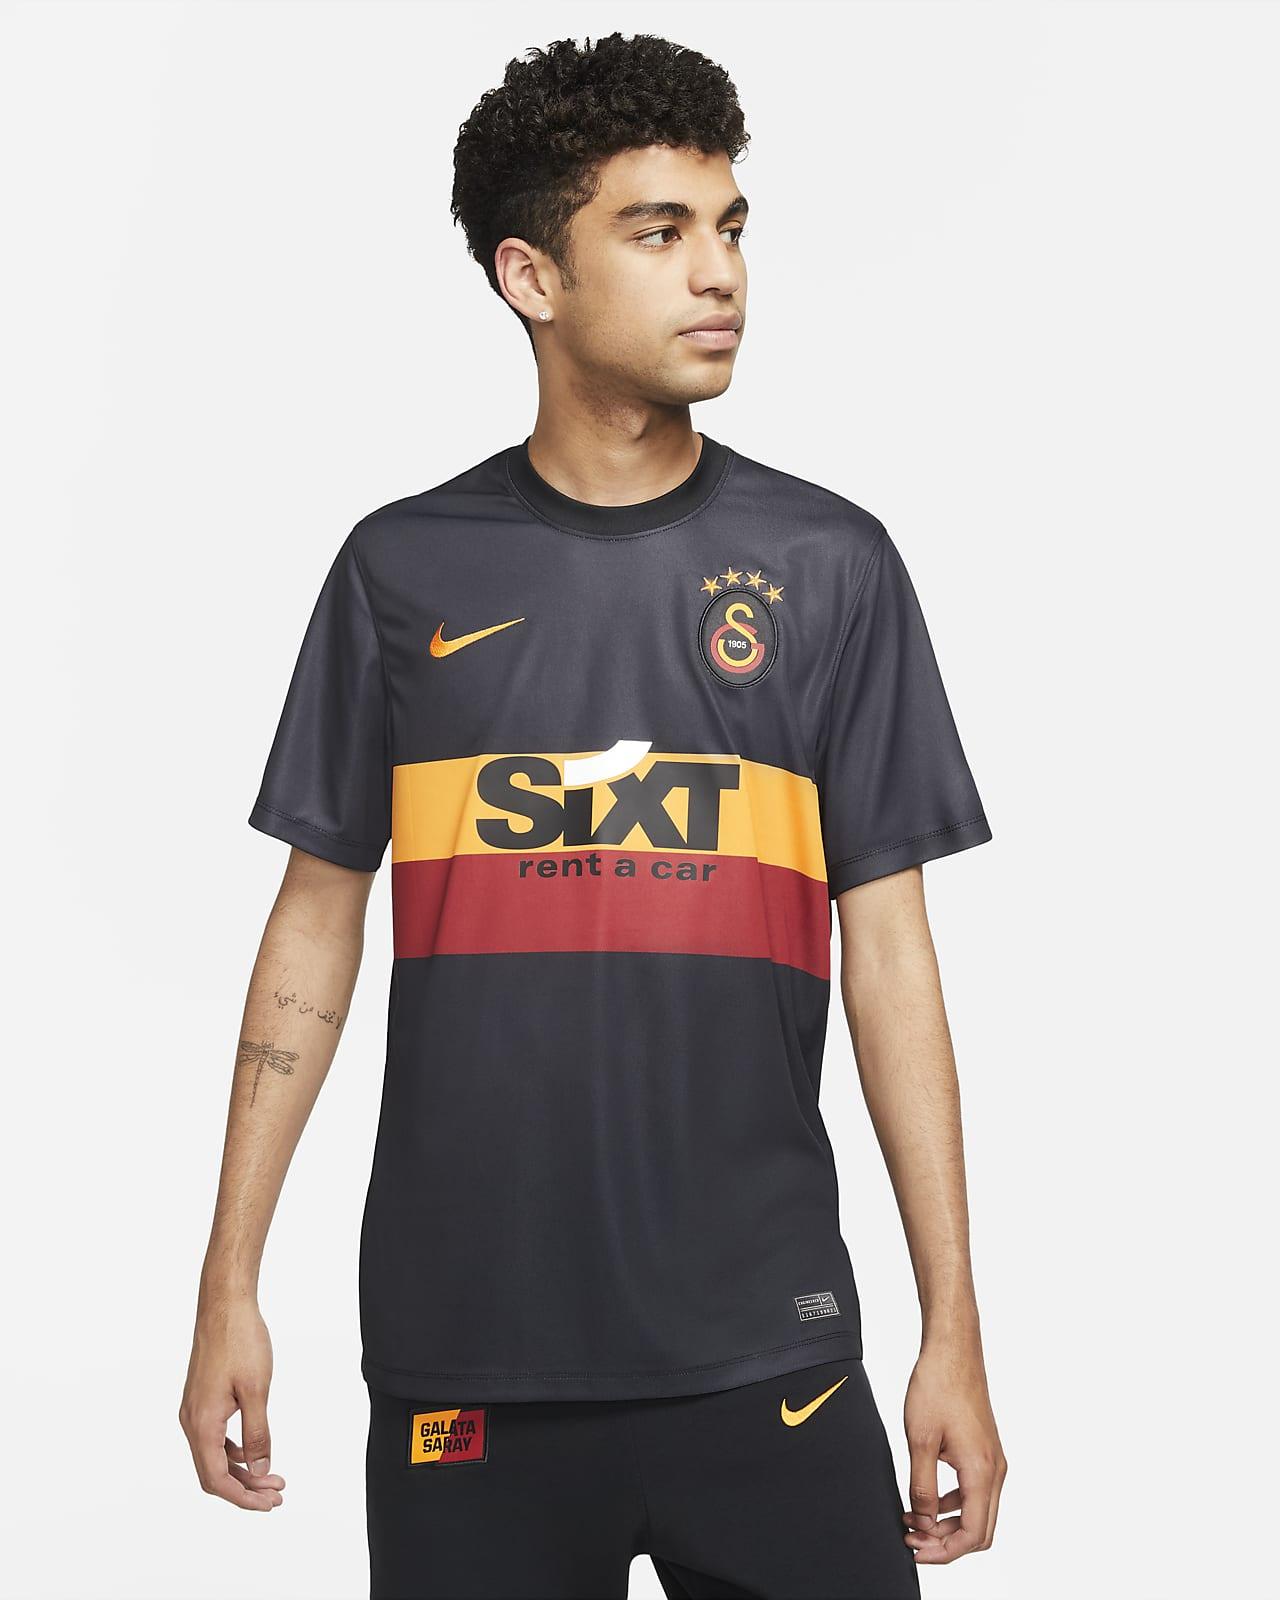 Galatasaray Deplasman Nike Dri-FIT Kısa Kollu Erkek Futbol Üstü